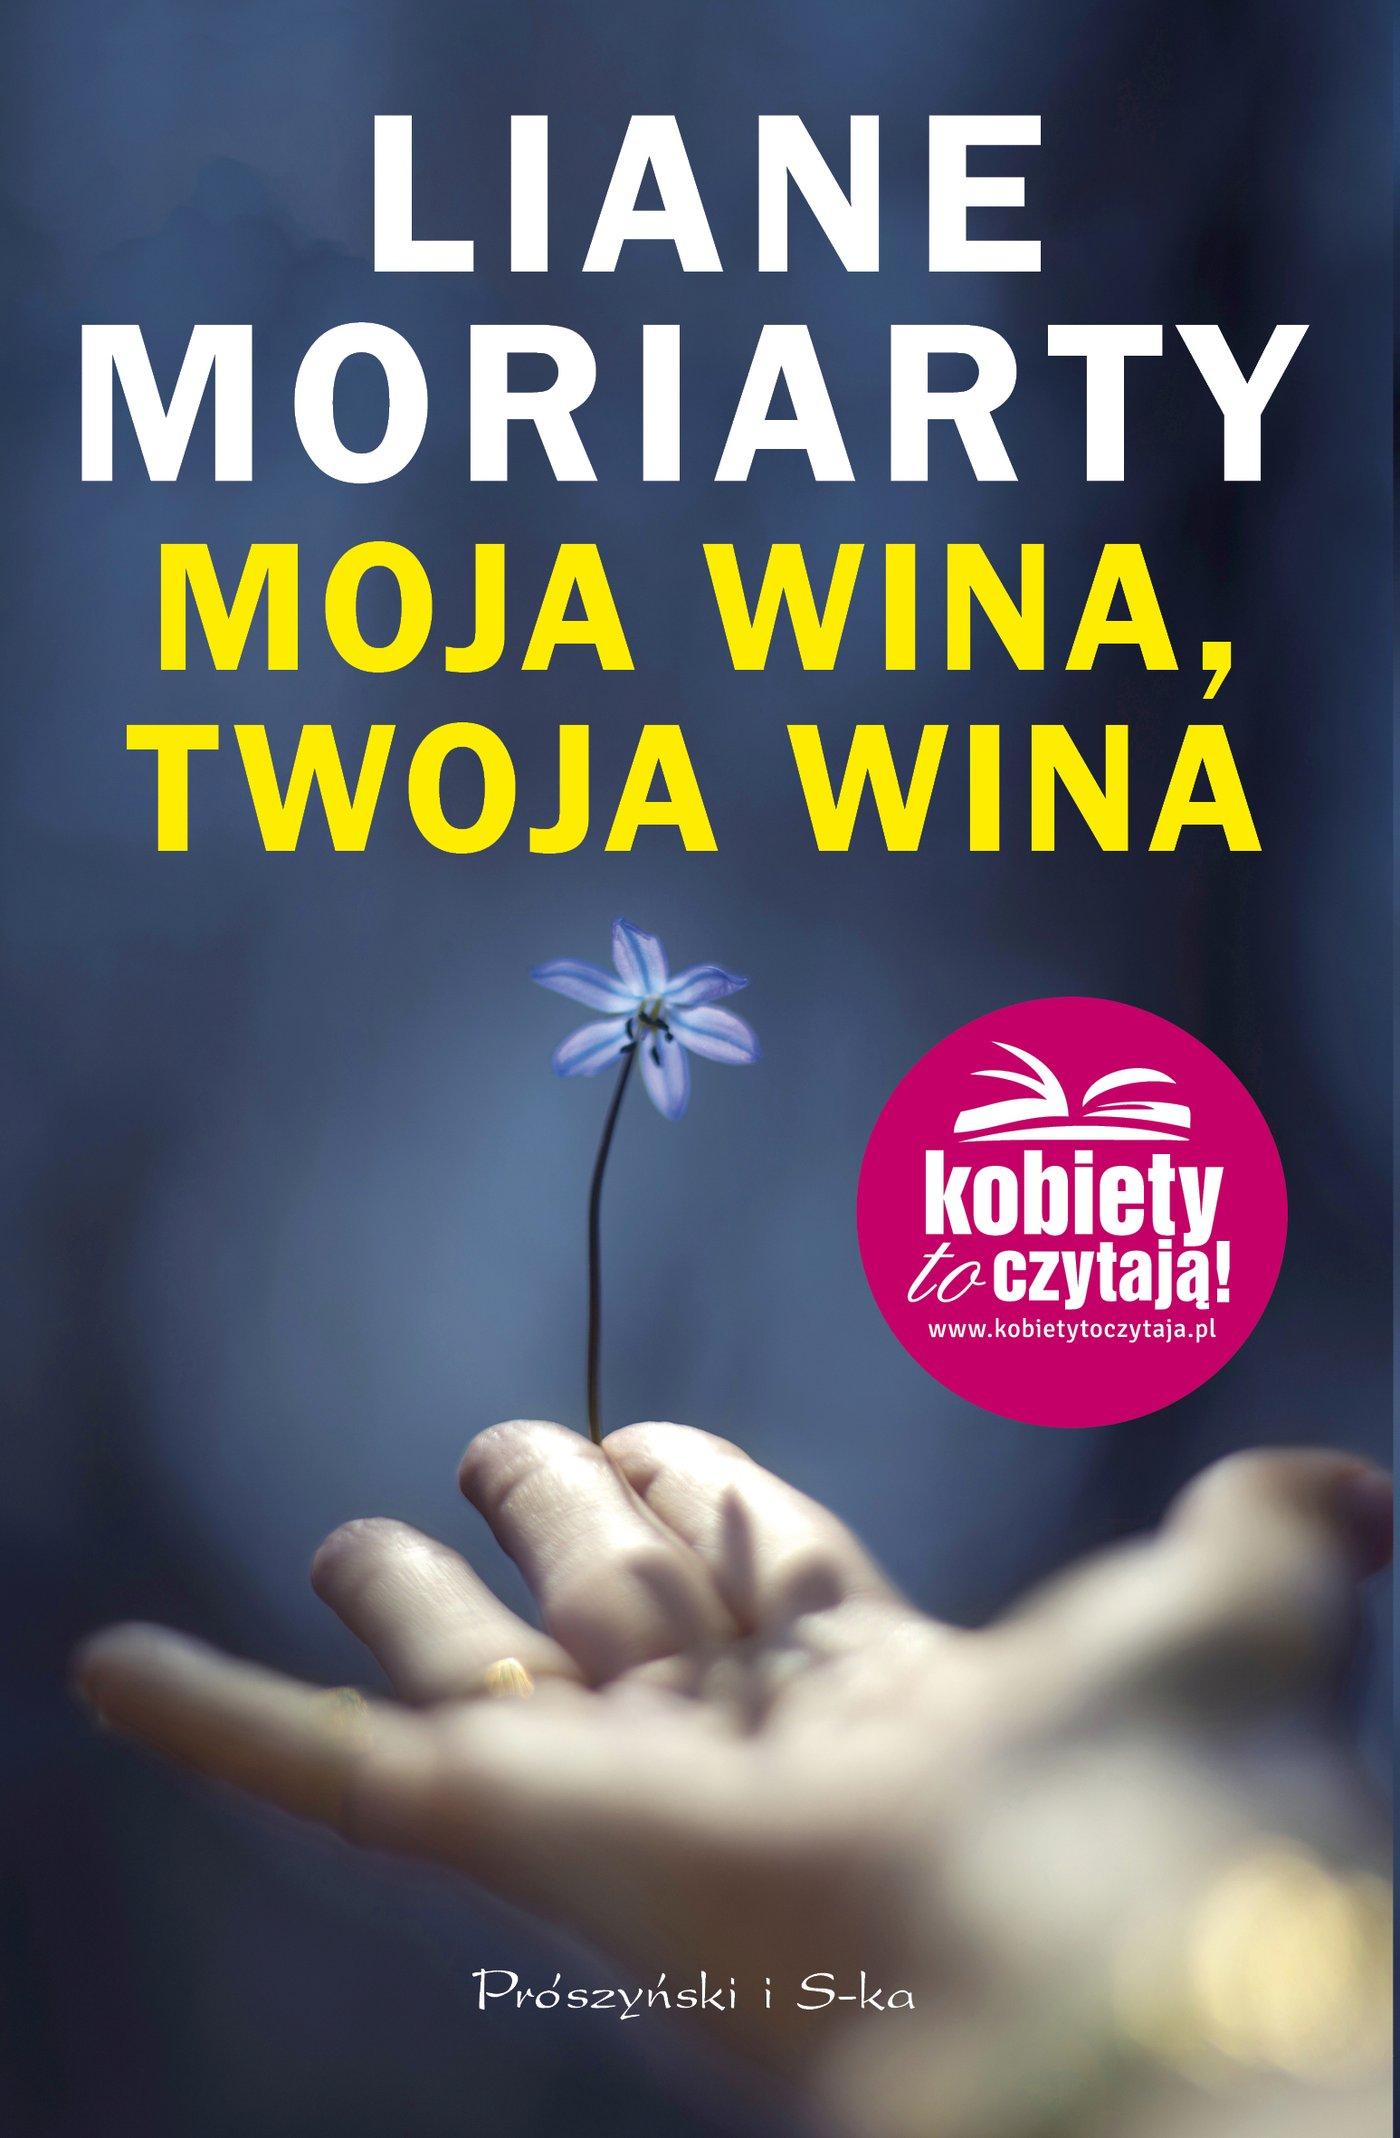 Moja wina, twoja wina - Ebook (Książka na Kindle) do pobrania w formacie MOBI